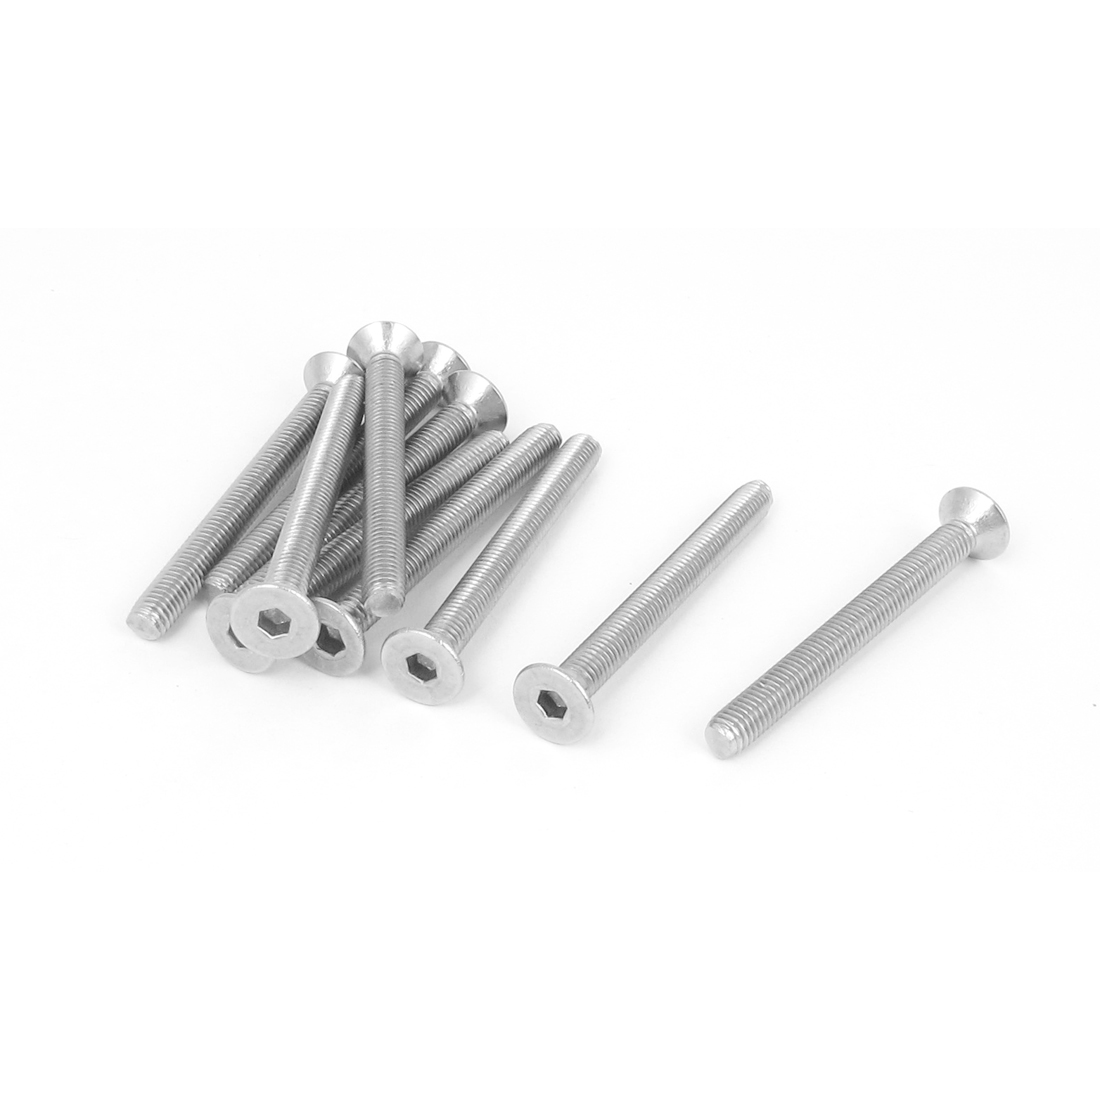 M5 x 50mm Metric 304 Stainless Steel Hex Socket Countersunk Flat Head Screw Bolts 10PCS